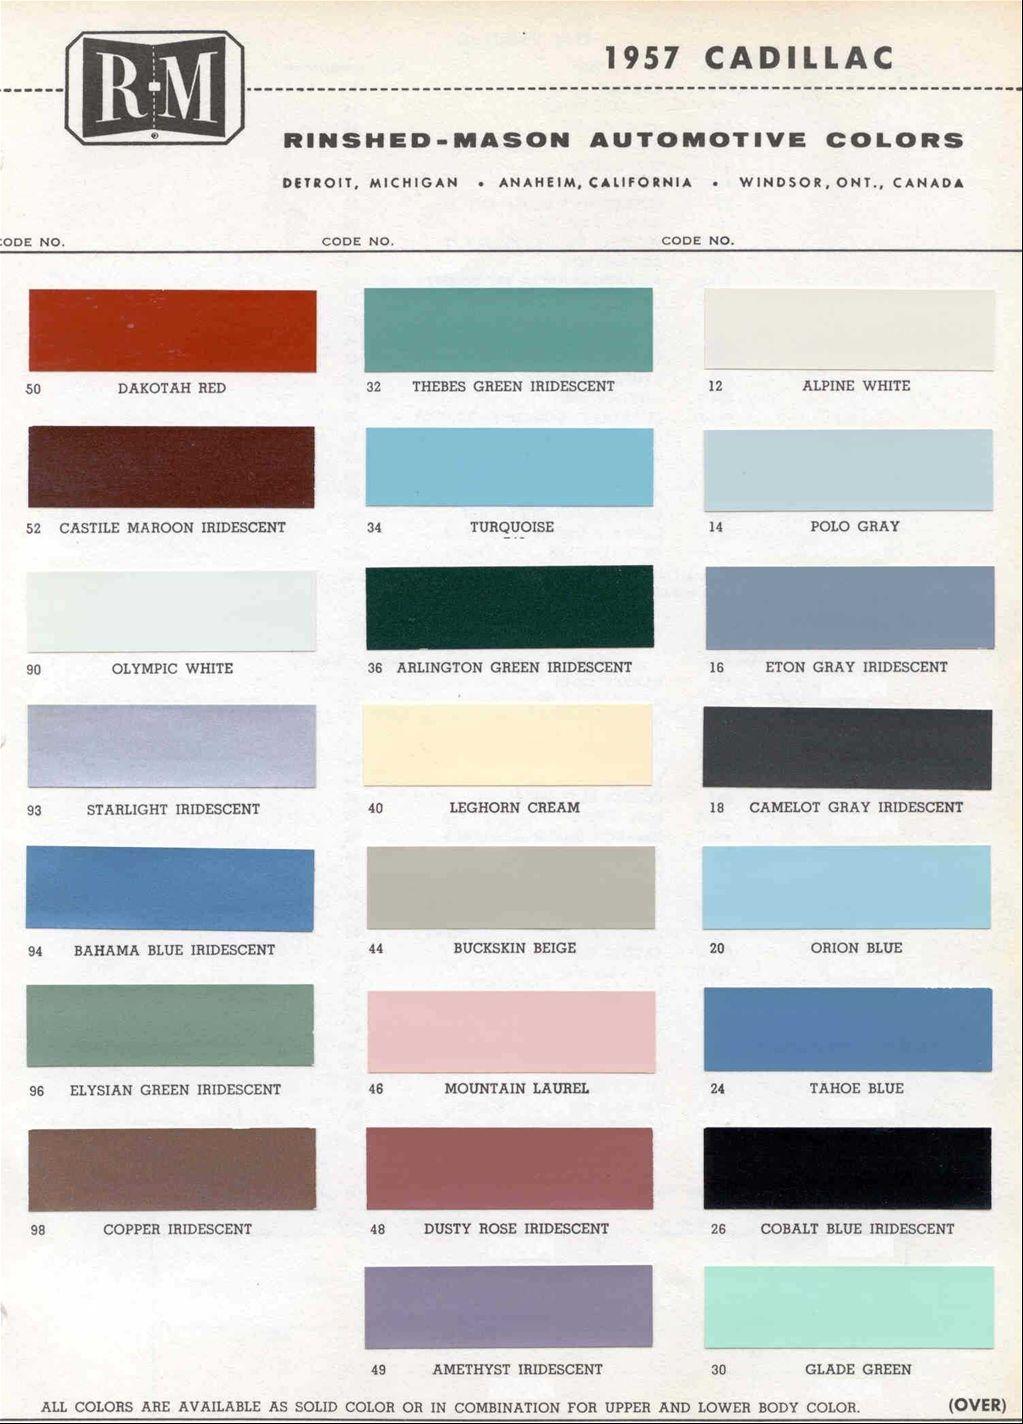 1957 Cadillac Colors Paint Pinterest Cadillac Cars And